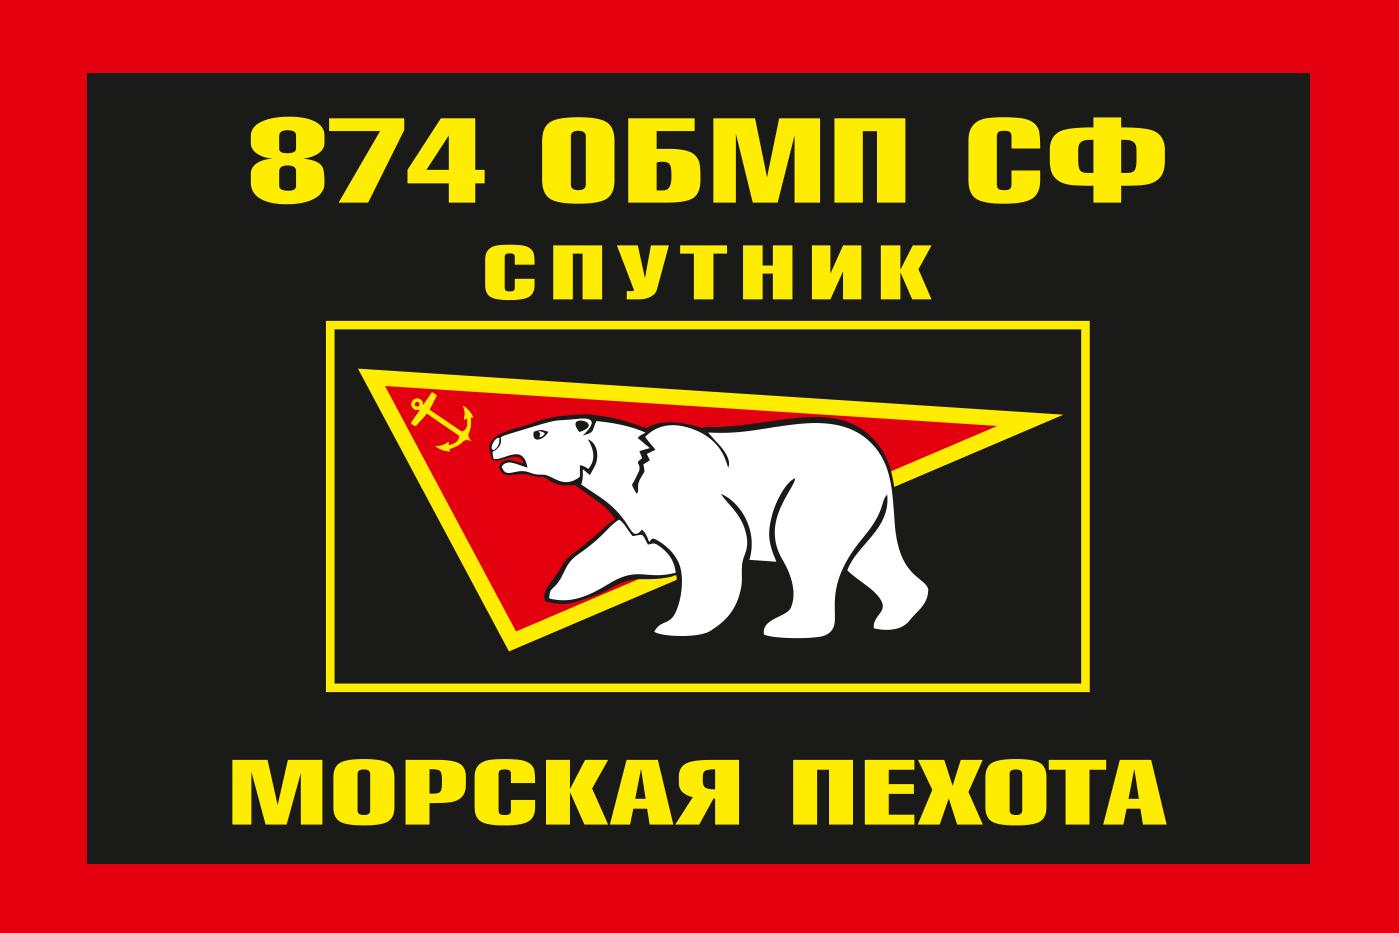 Двухсторонний флаг «Морская пехота Спутник»